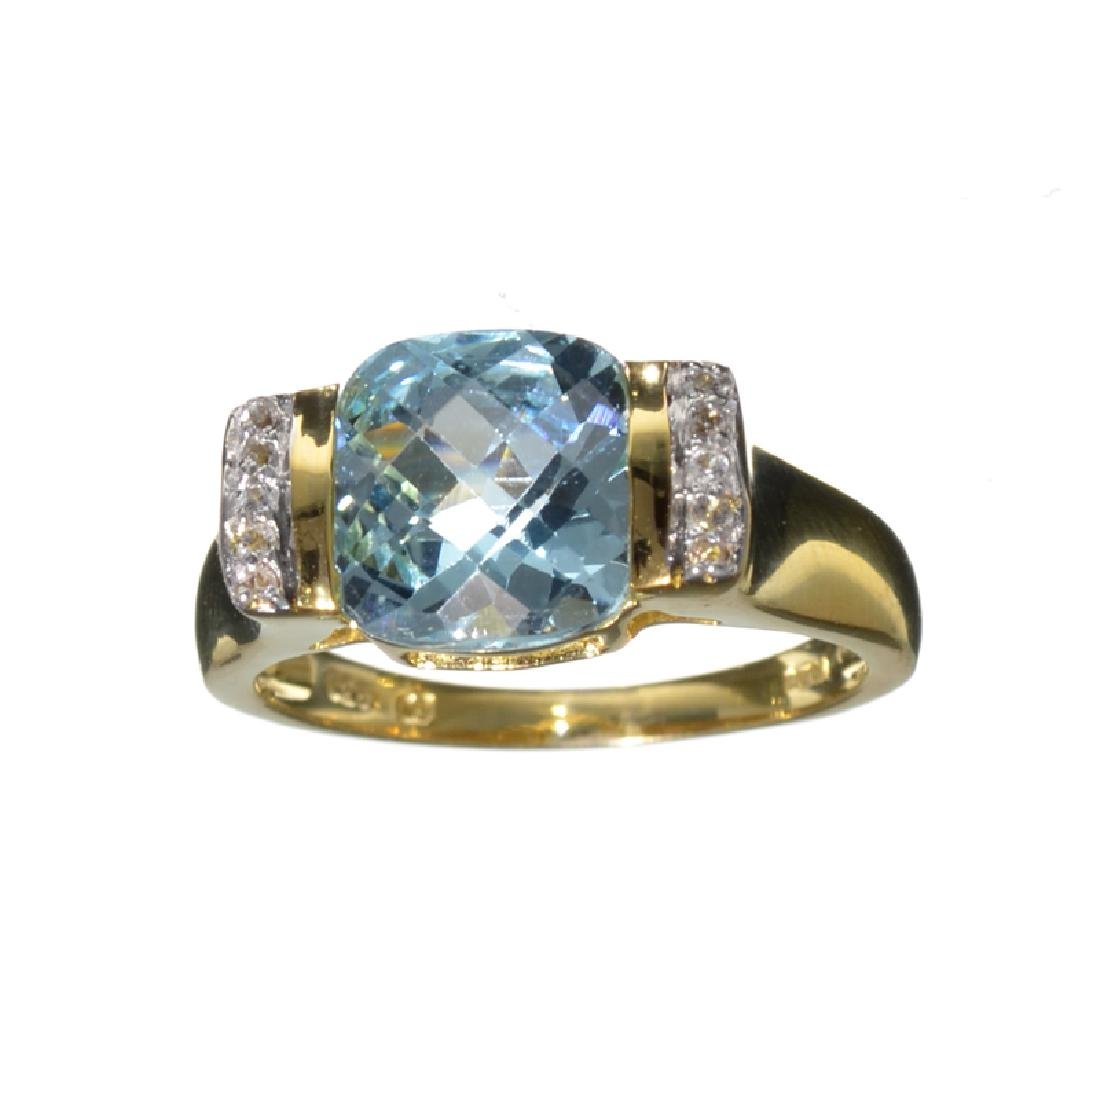 Fine Jewelry 4.15CT Blue Topaz And White Sapphire W a